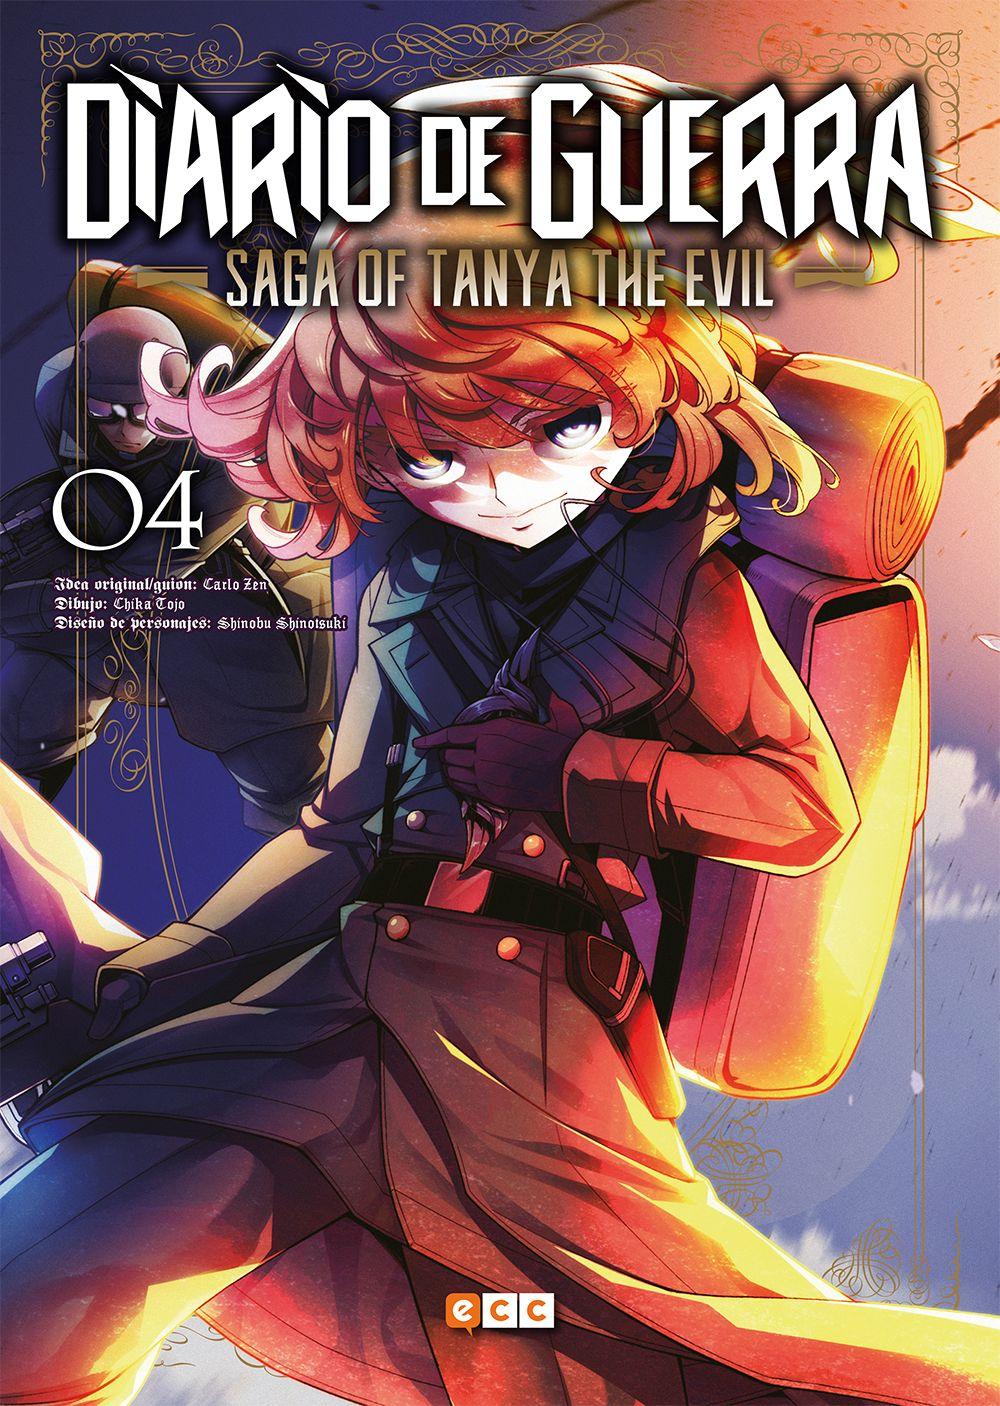 Diario de guerra – Saga of Tanya the Evil 4